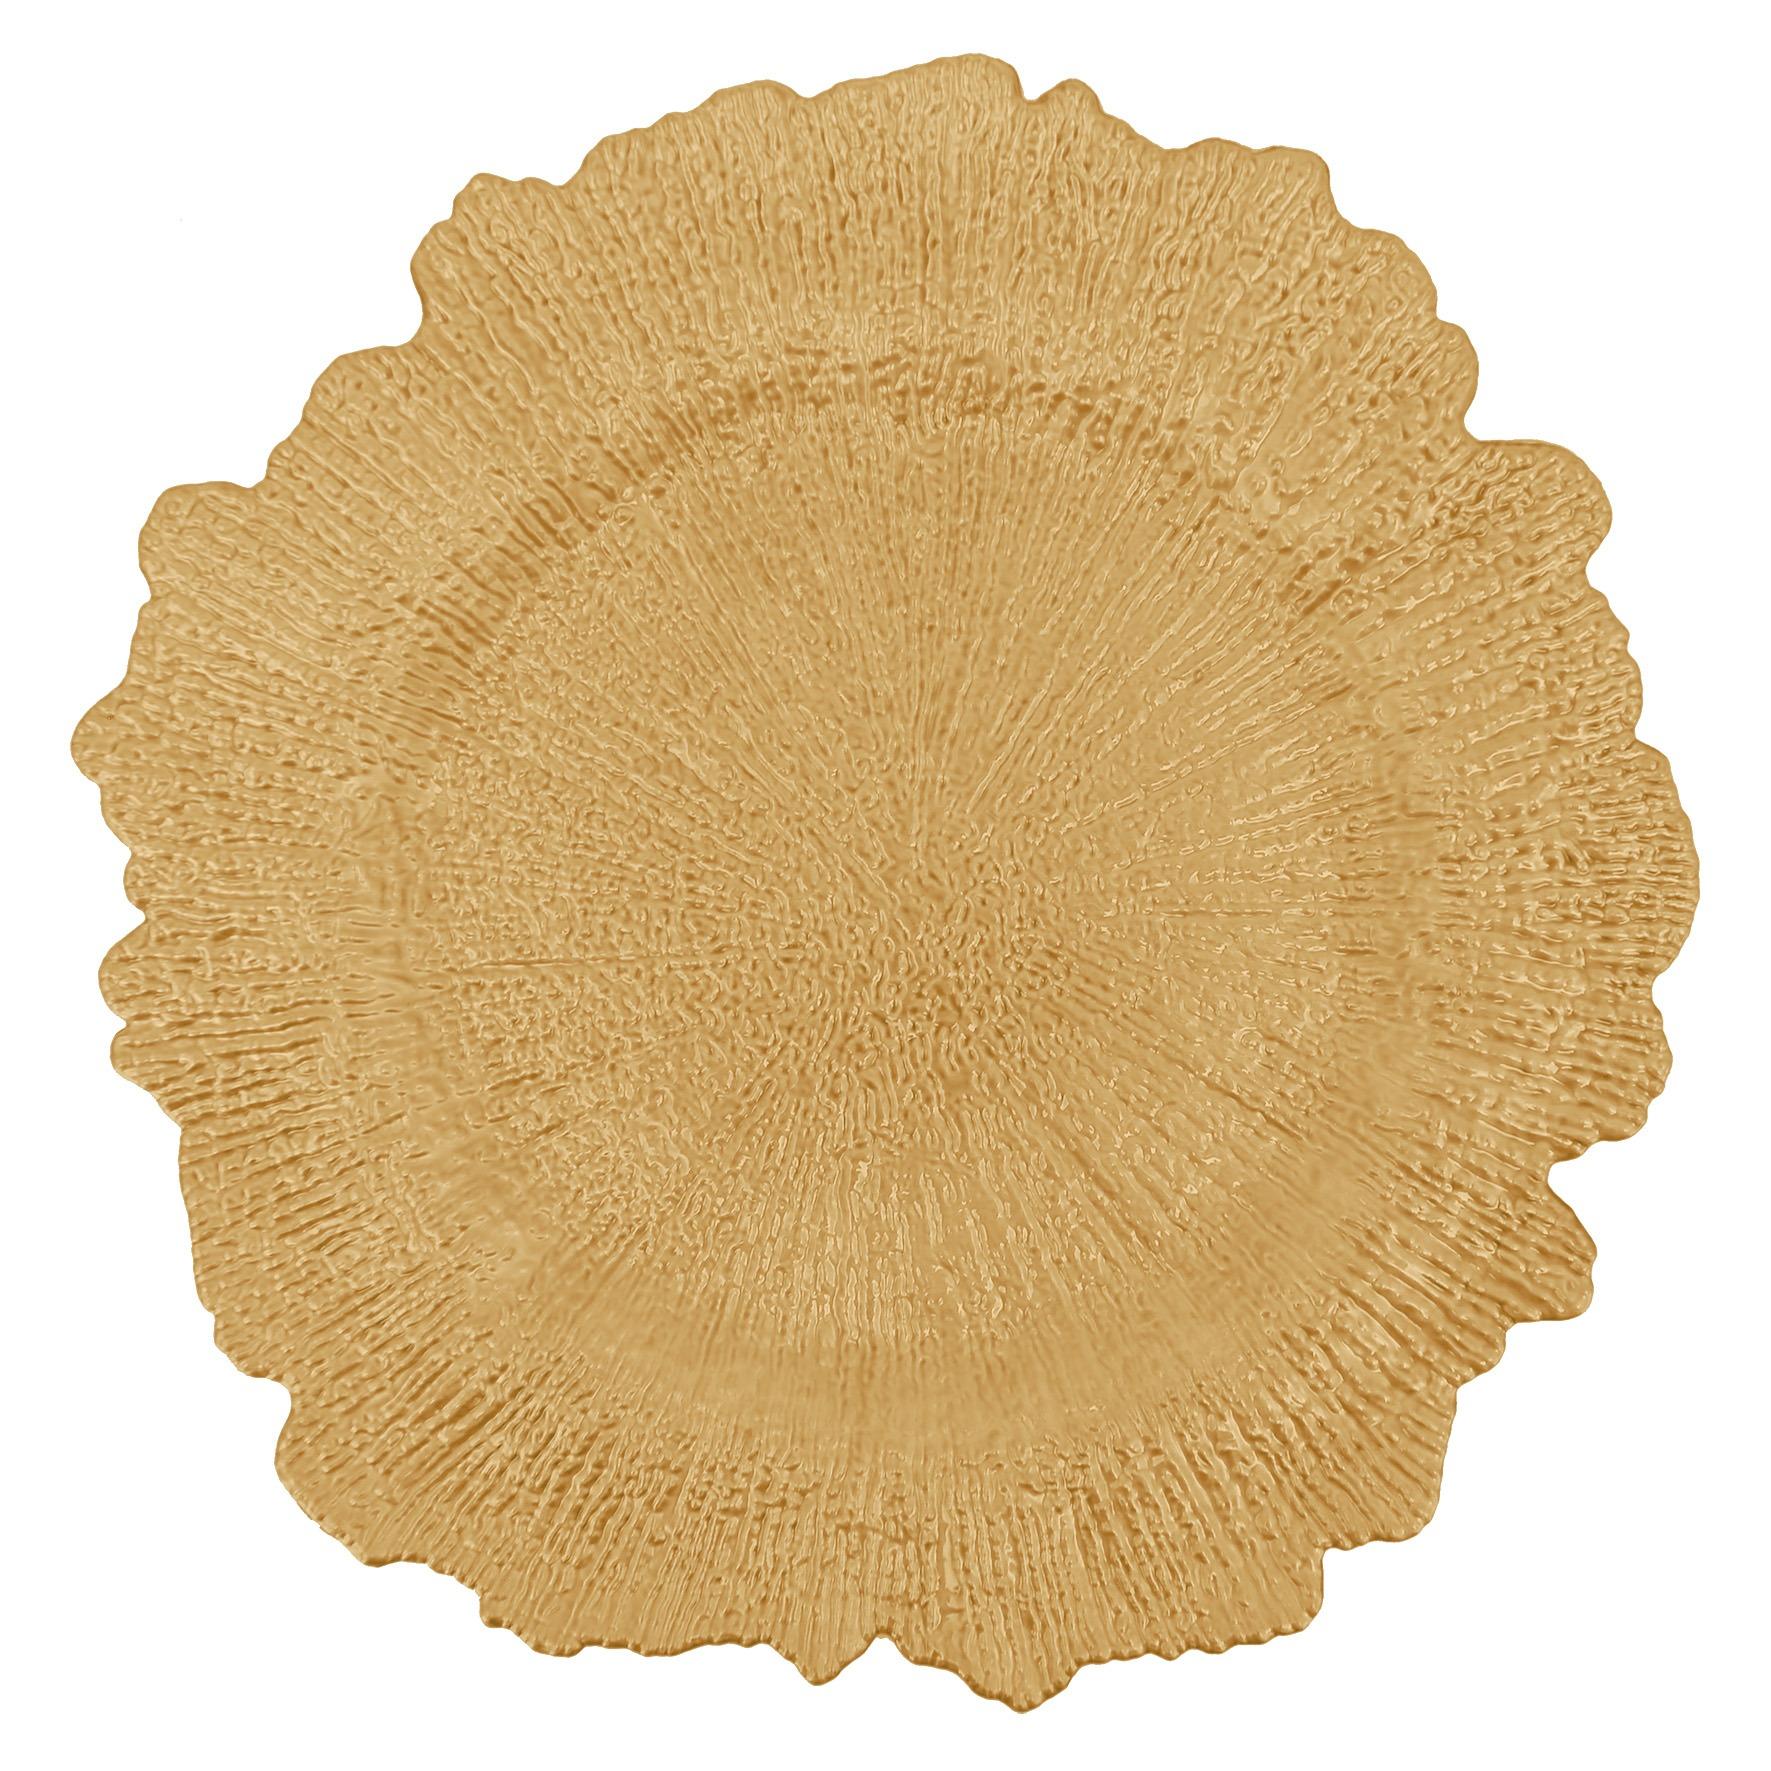 Sousplat Redondo Plastico 35cm Dourado - Yangzi